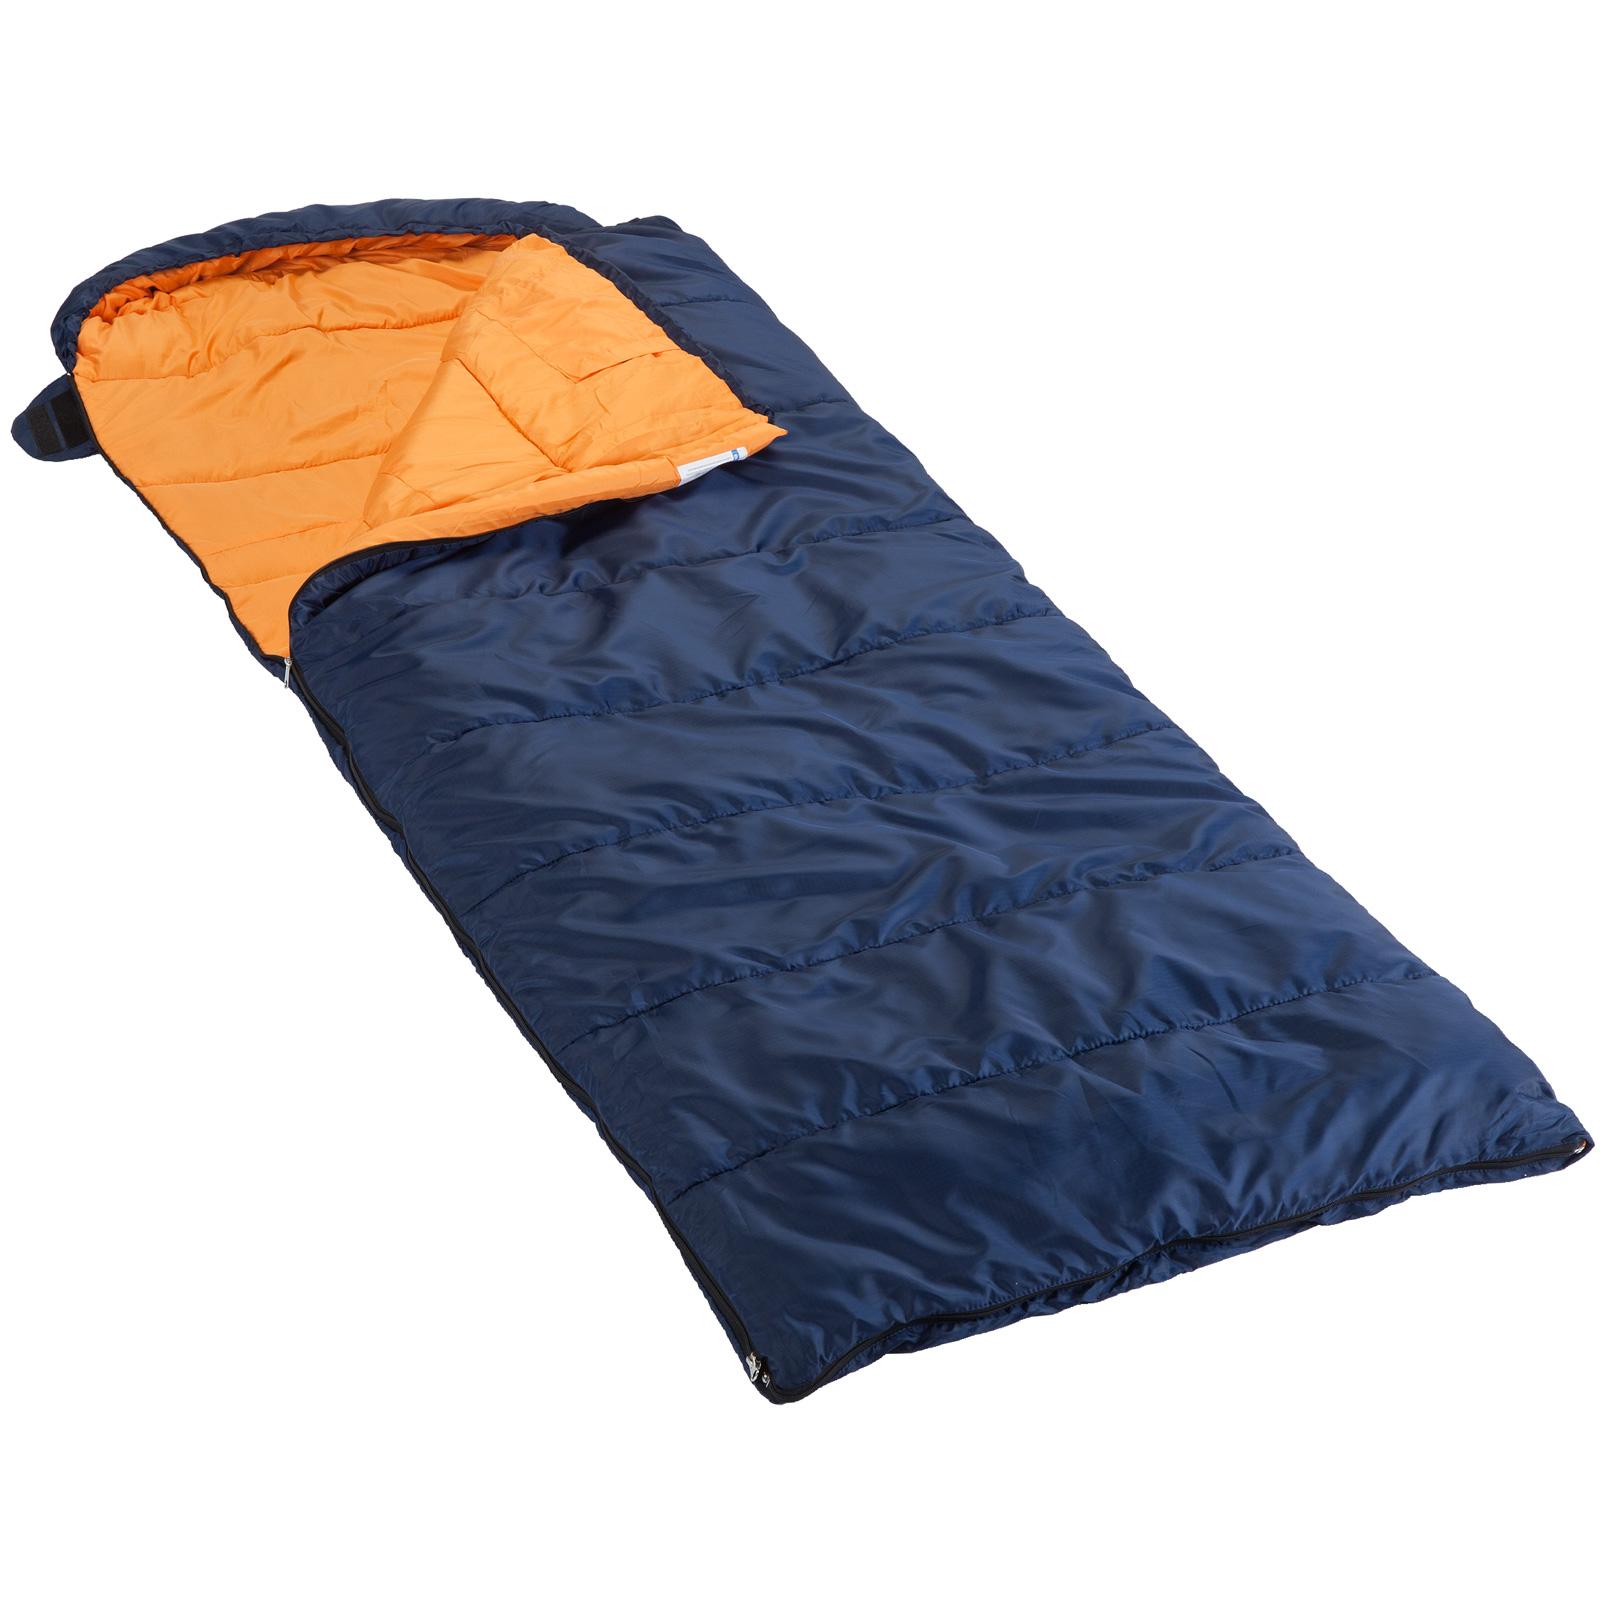 skandika camping sleeping bags mummy envelope 8 models xl. Black Bedroom Furniture Sets. Home Design Ideas